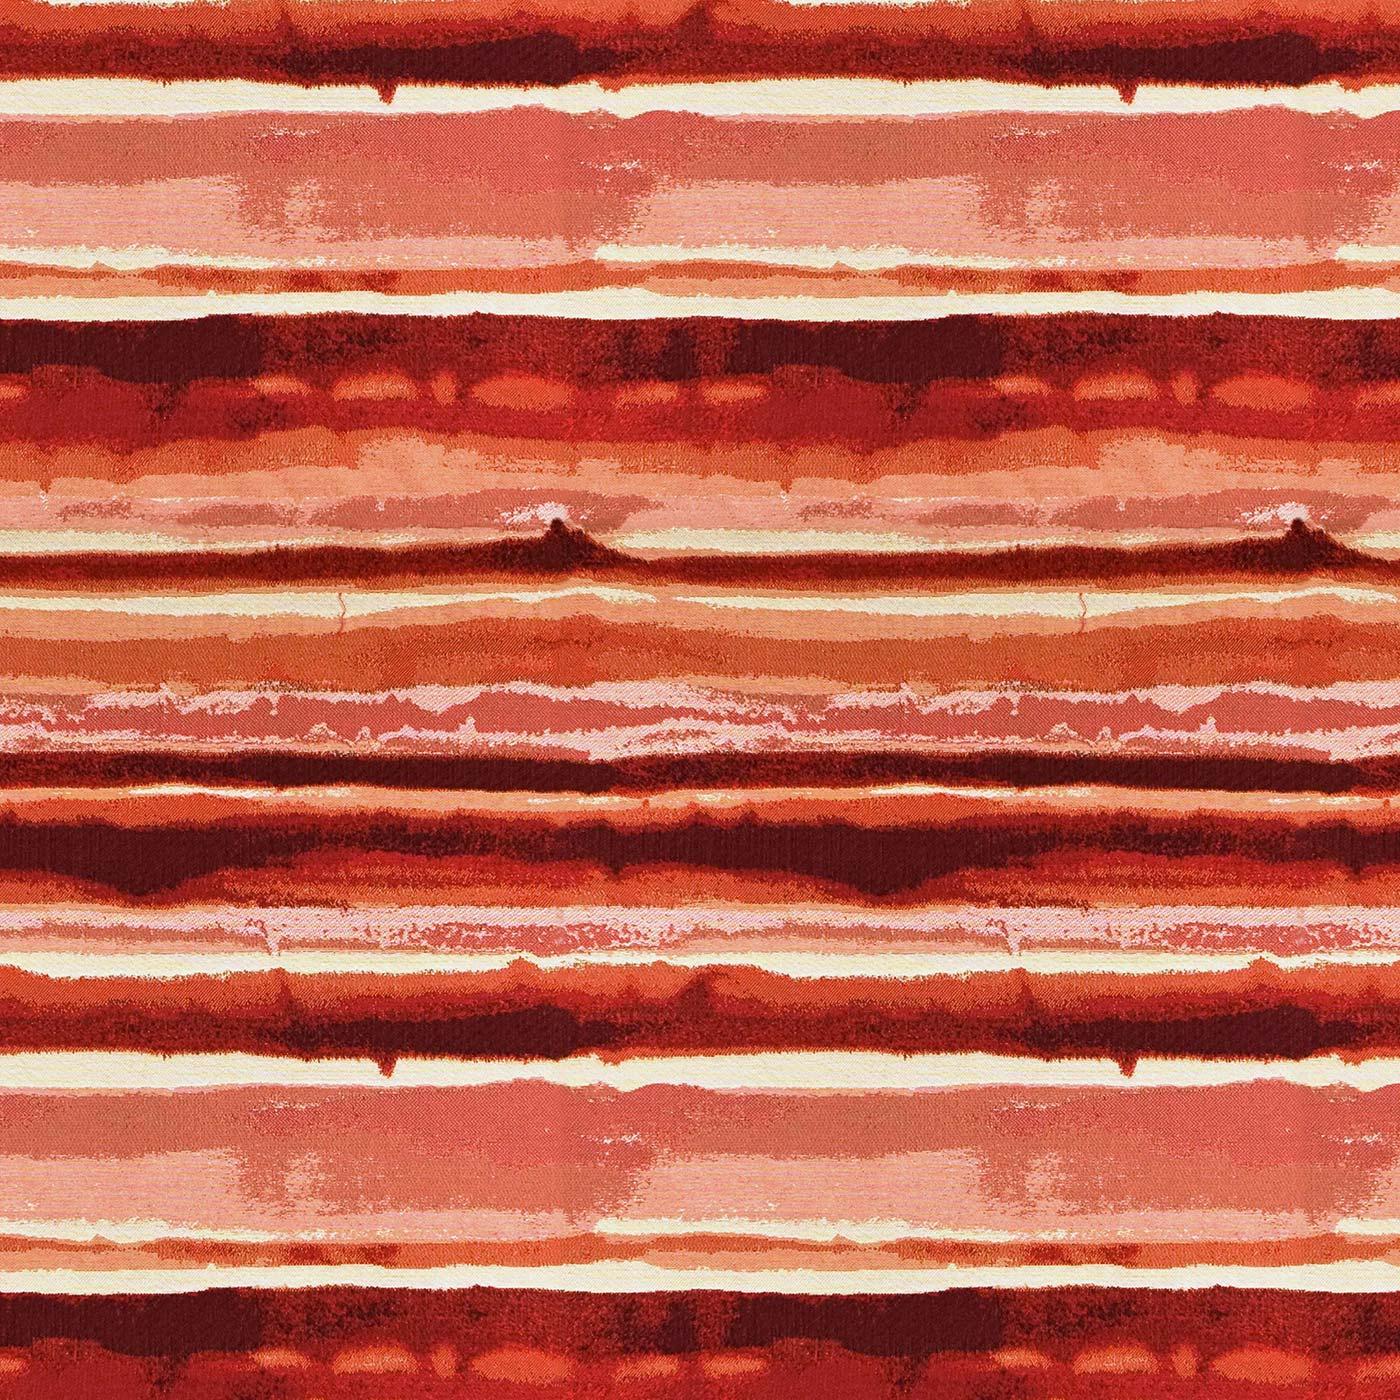 Mural Red